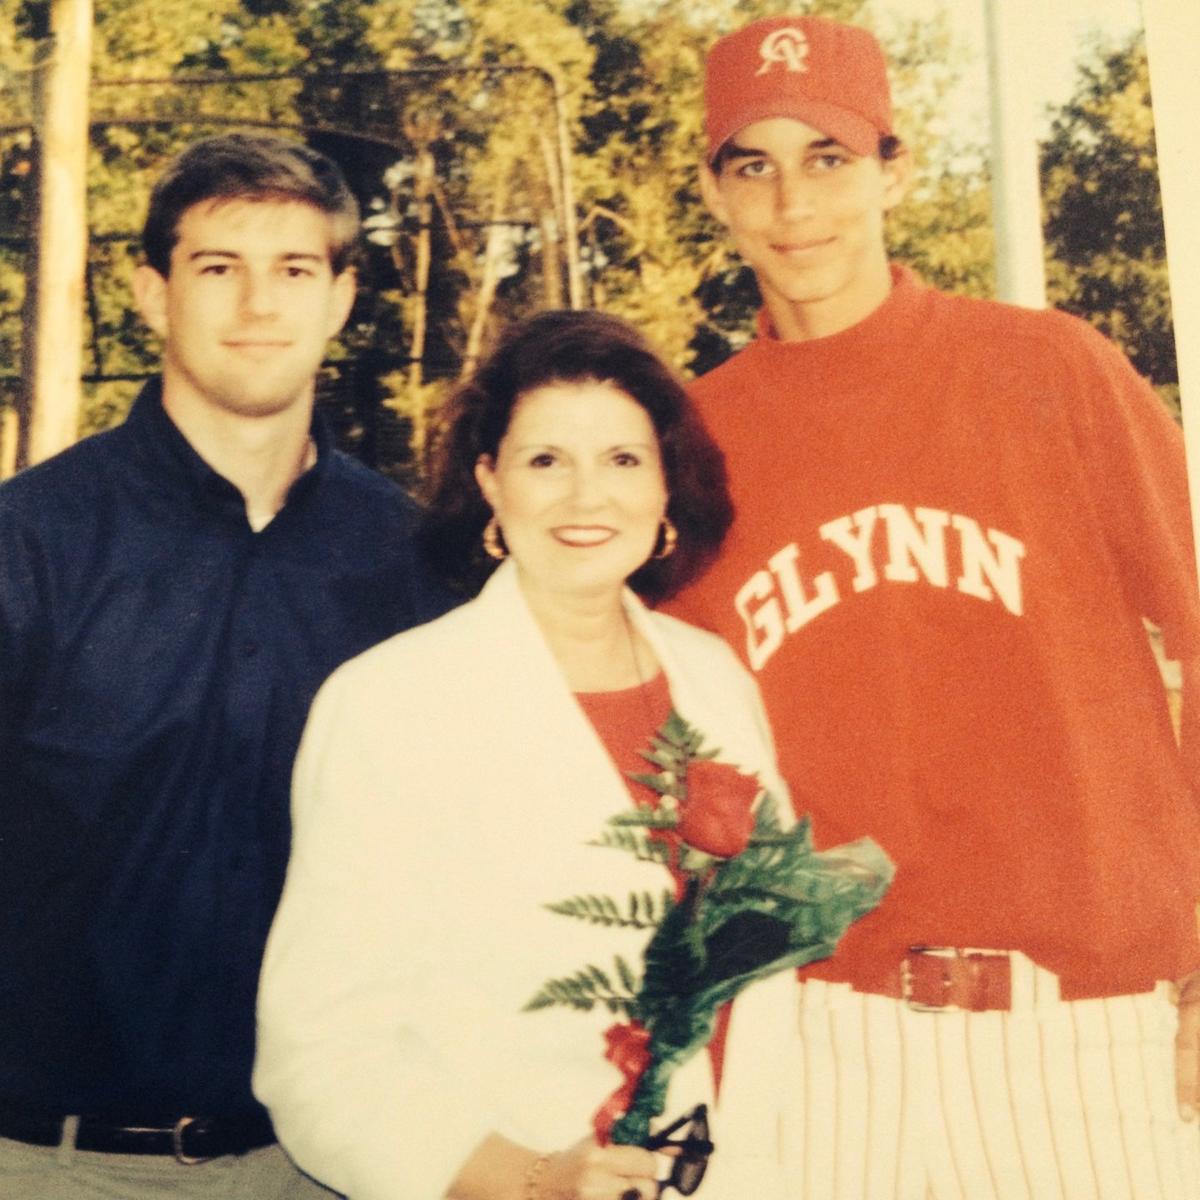 Adam Wainwright and his mother Nancy Wainwright